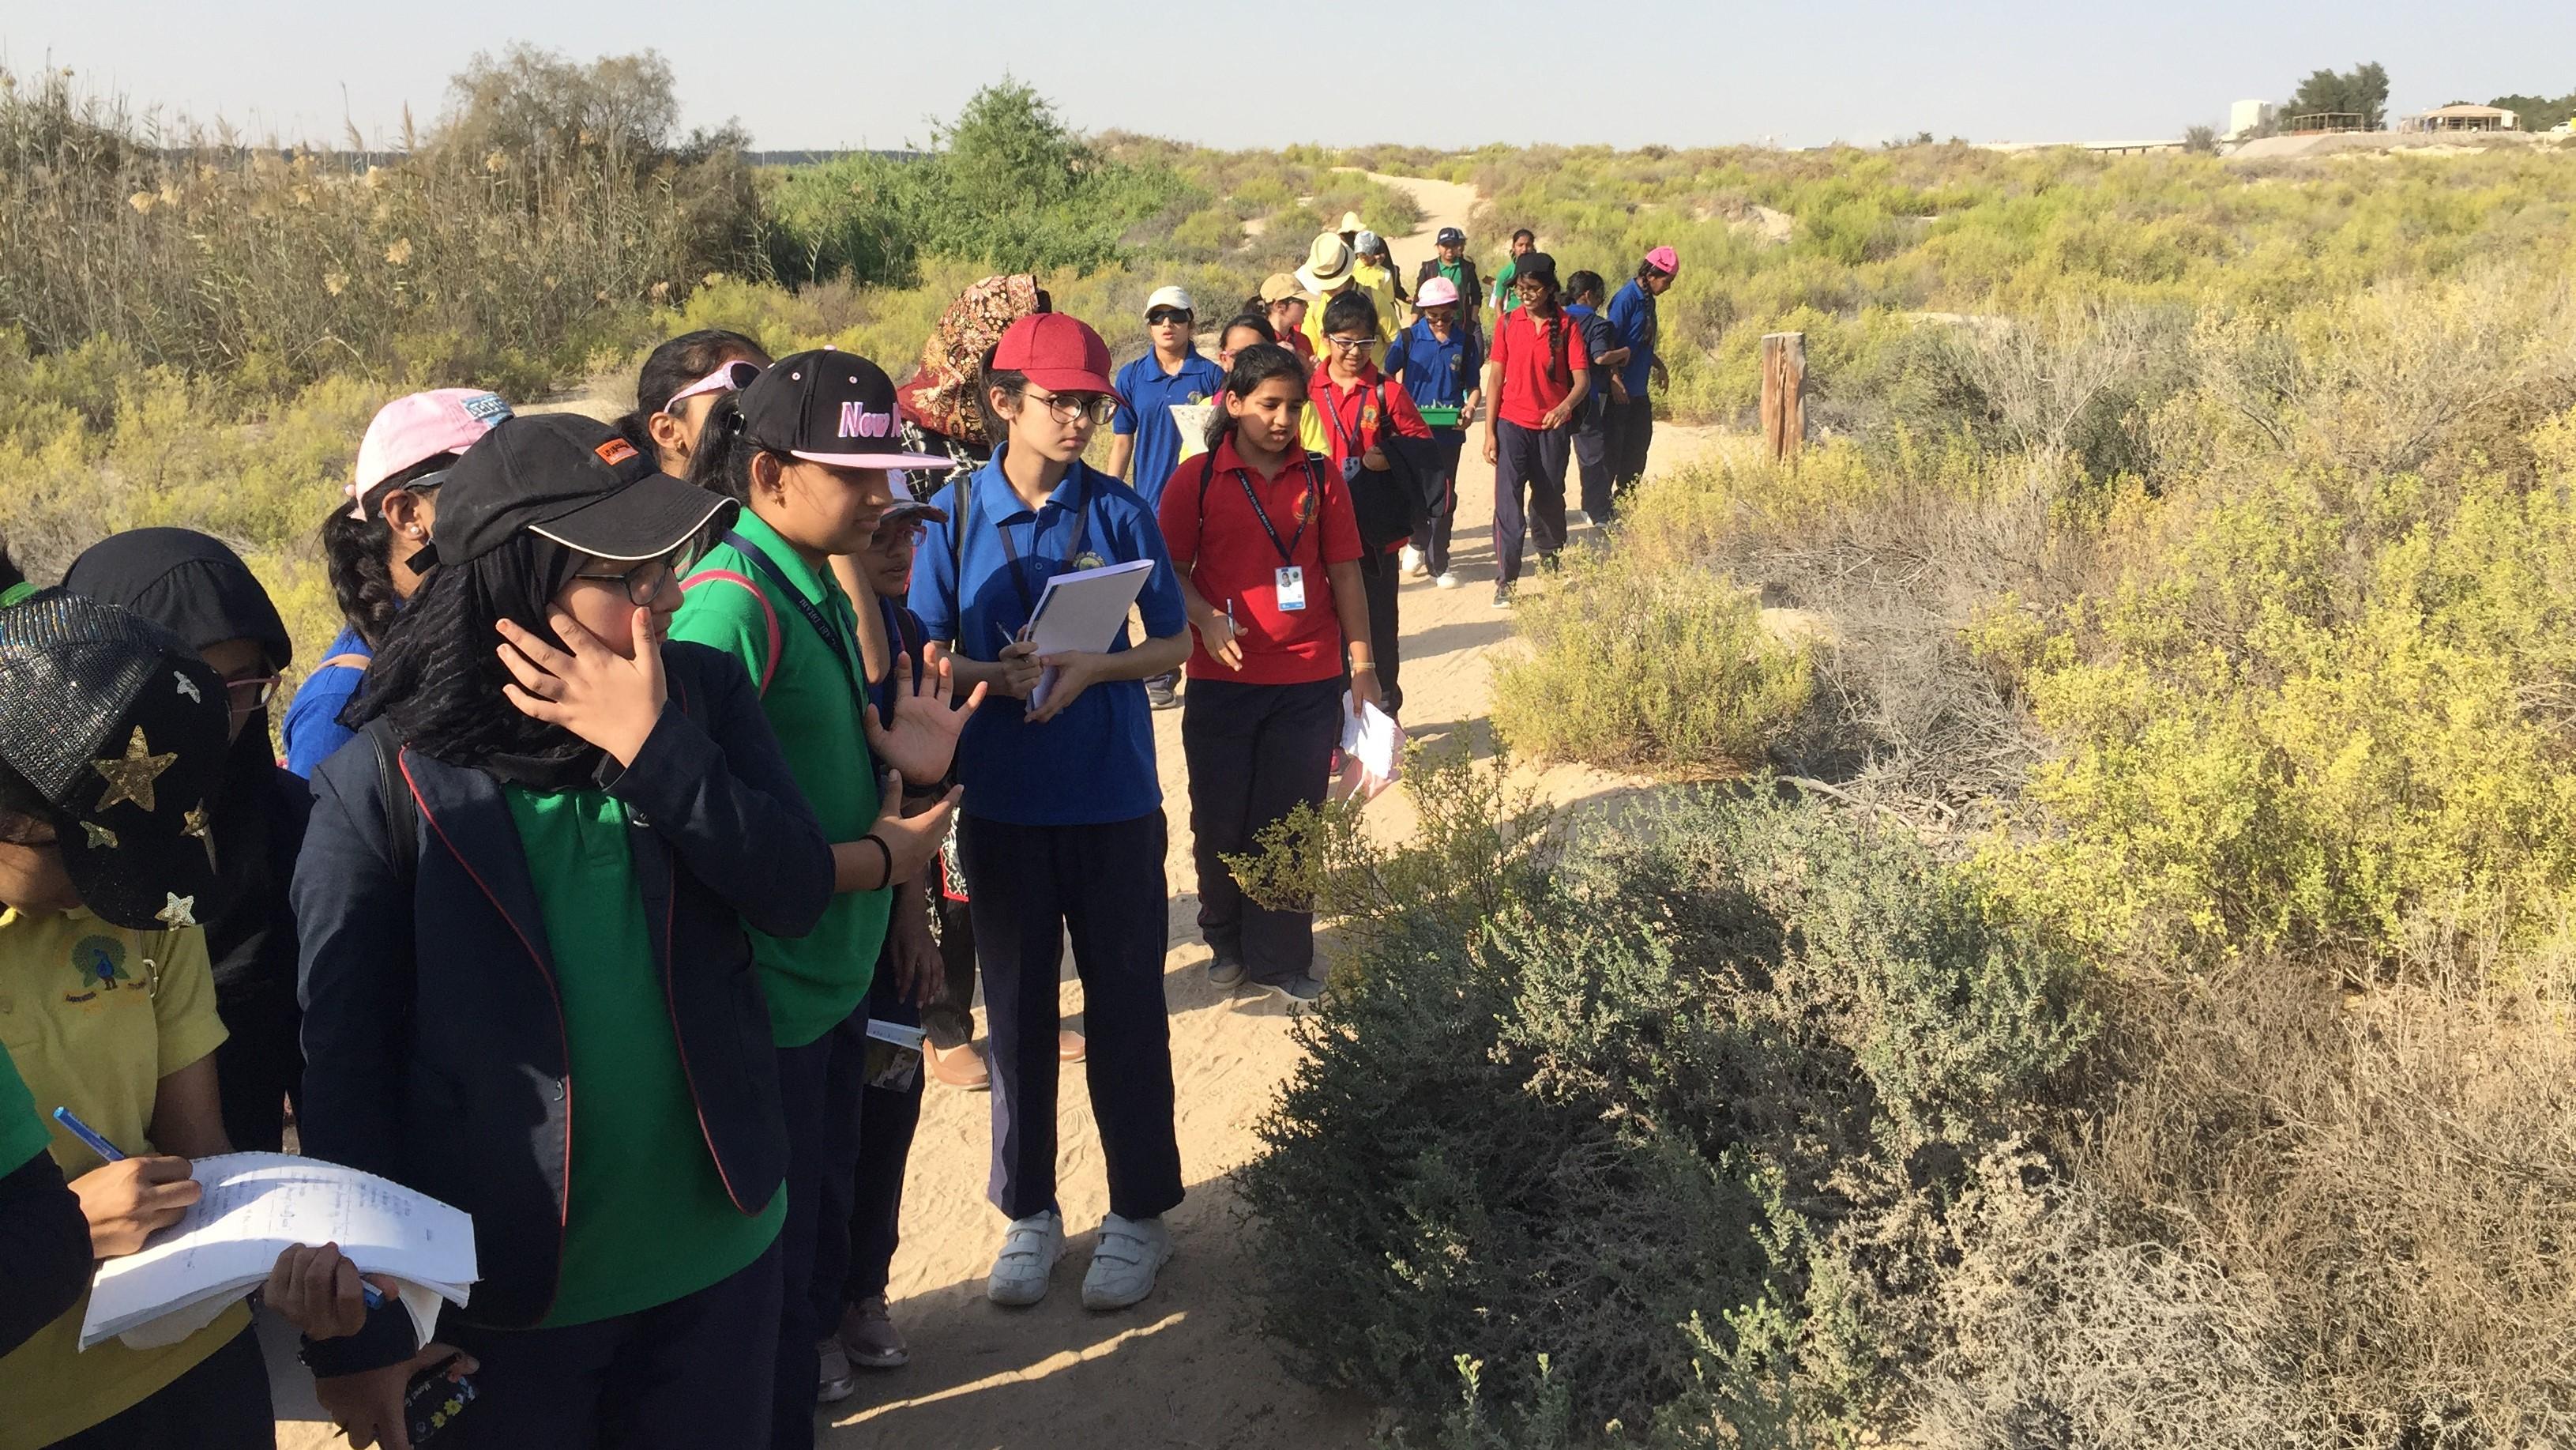 Eco_Chmapions_I_Mayoor_School_Abu_Dhbai_I_Al_Wathba_Wetland